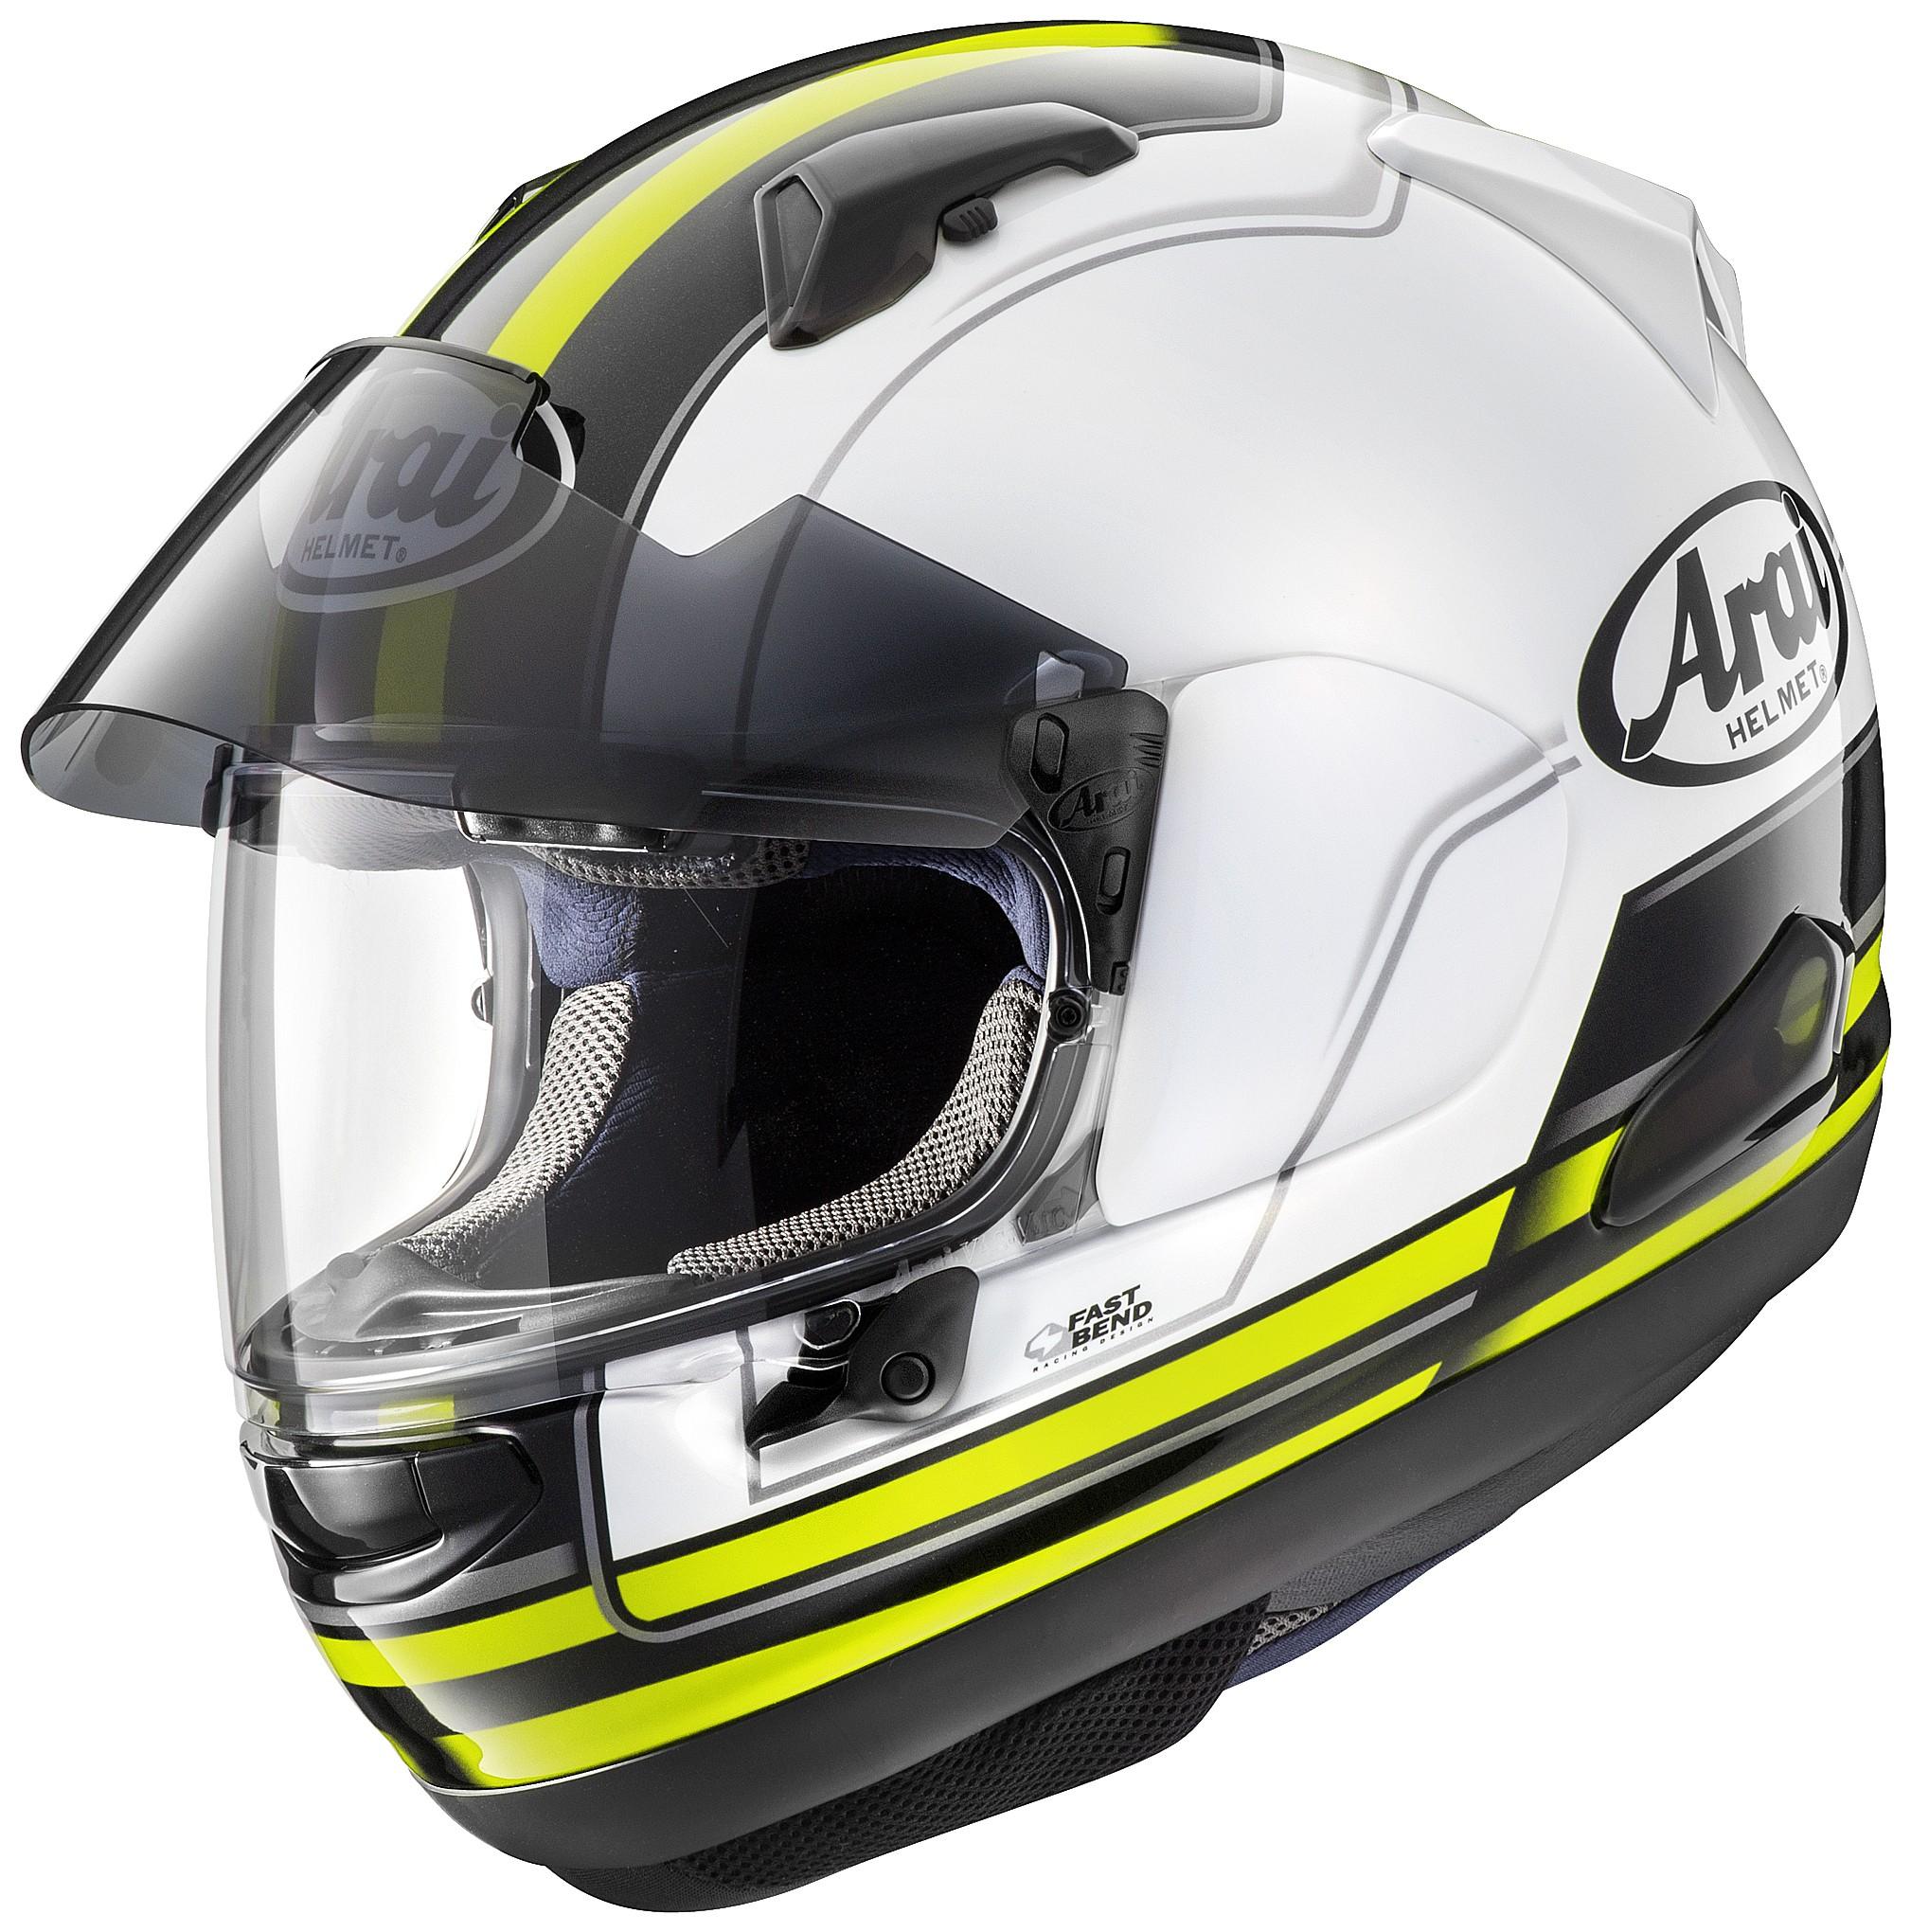 Best Motorcycle Touring Helmet Uk